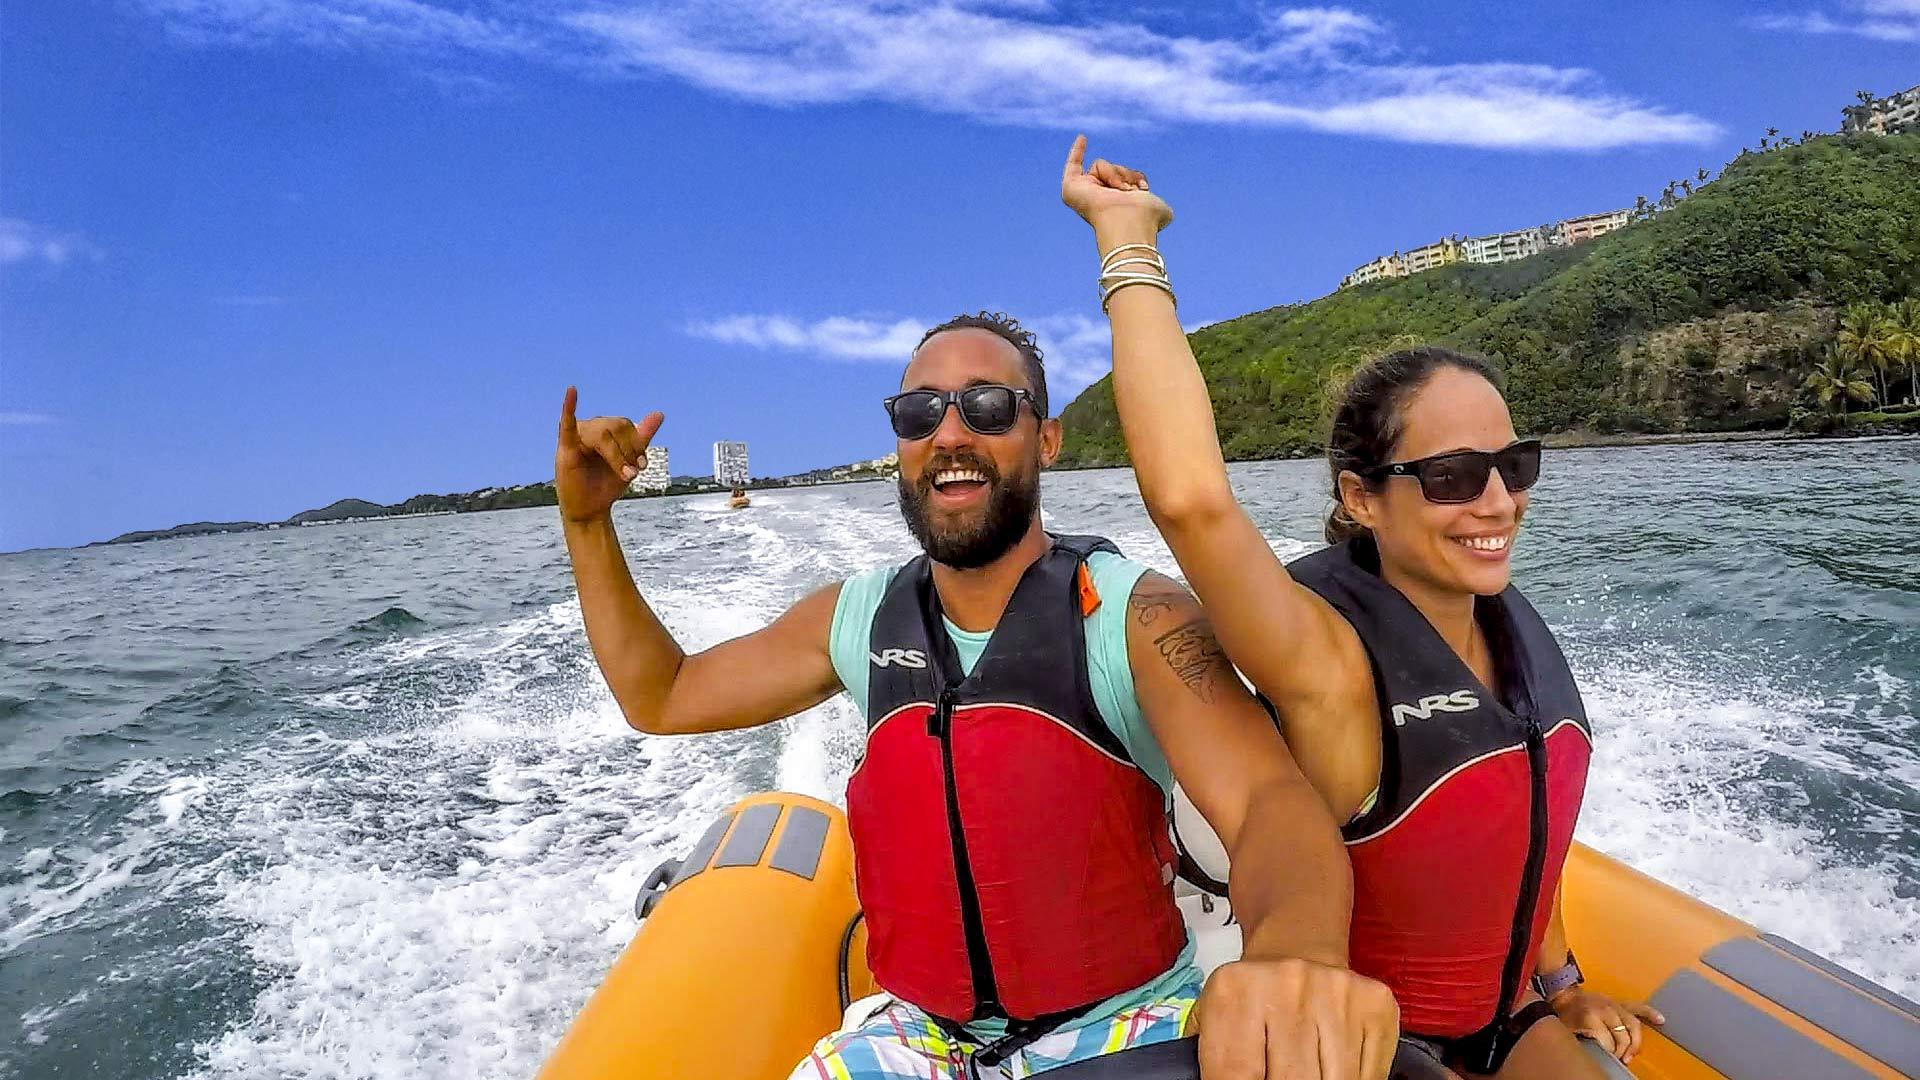 Man and woman enjoying the Snorkeling in Puerto Rico Mini Boat Tour of Kayaking Puerto Rico